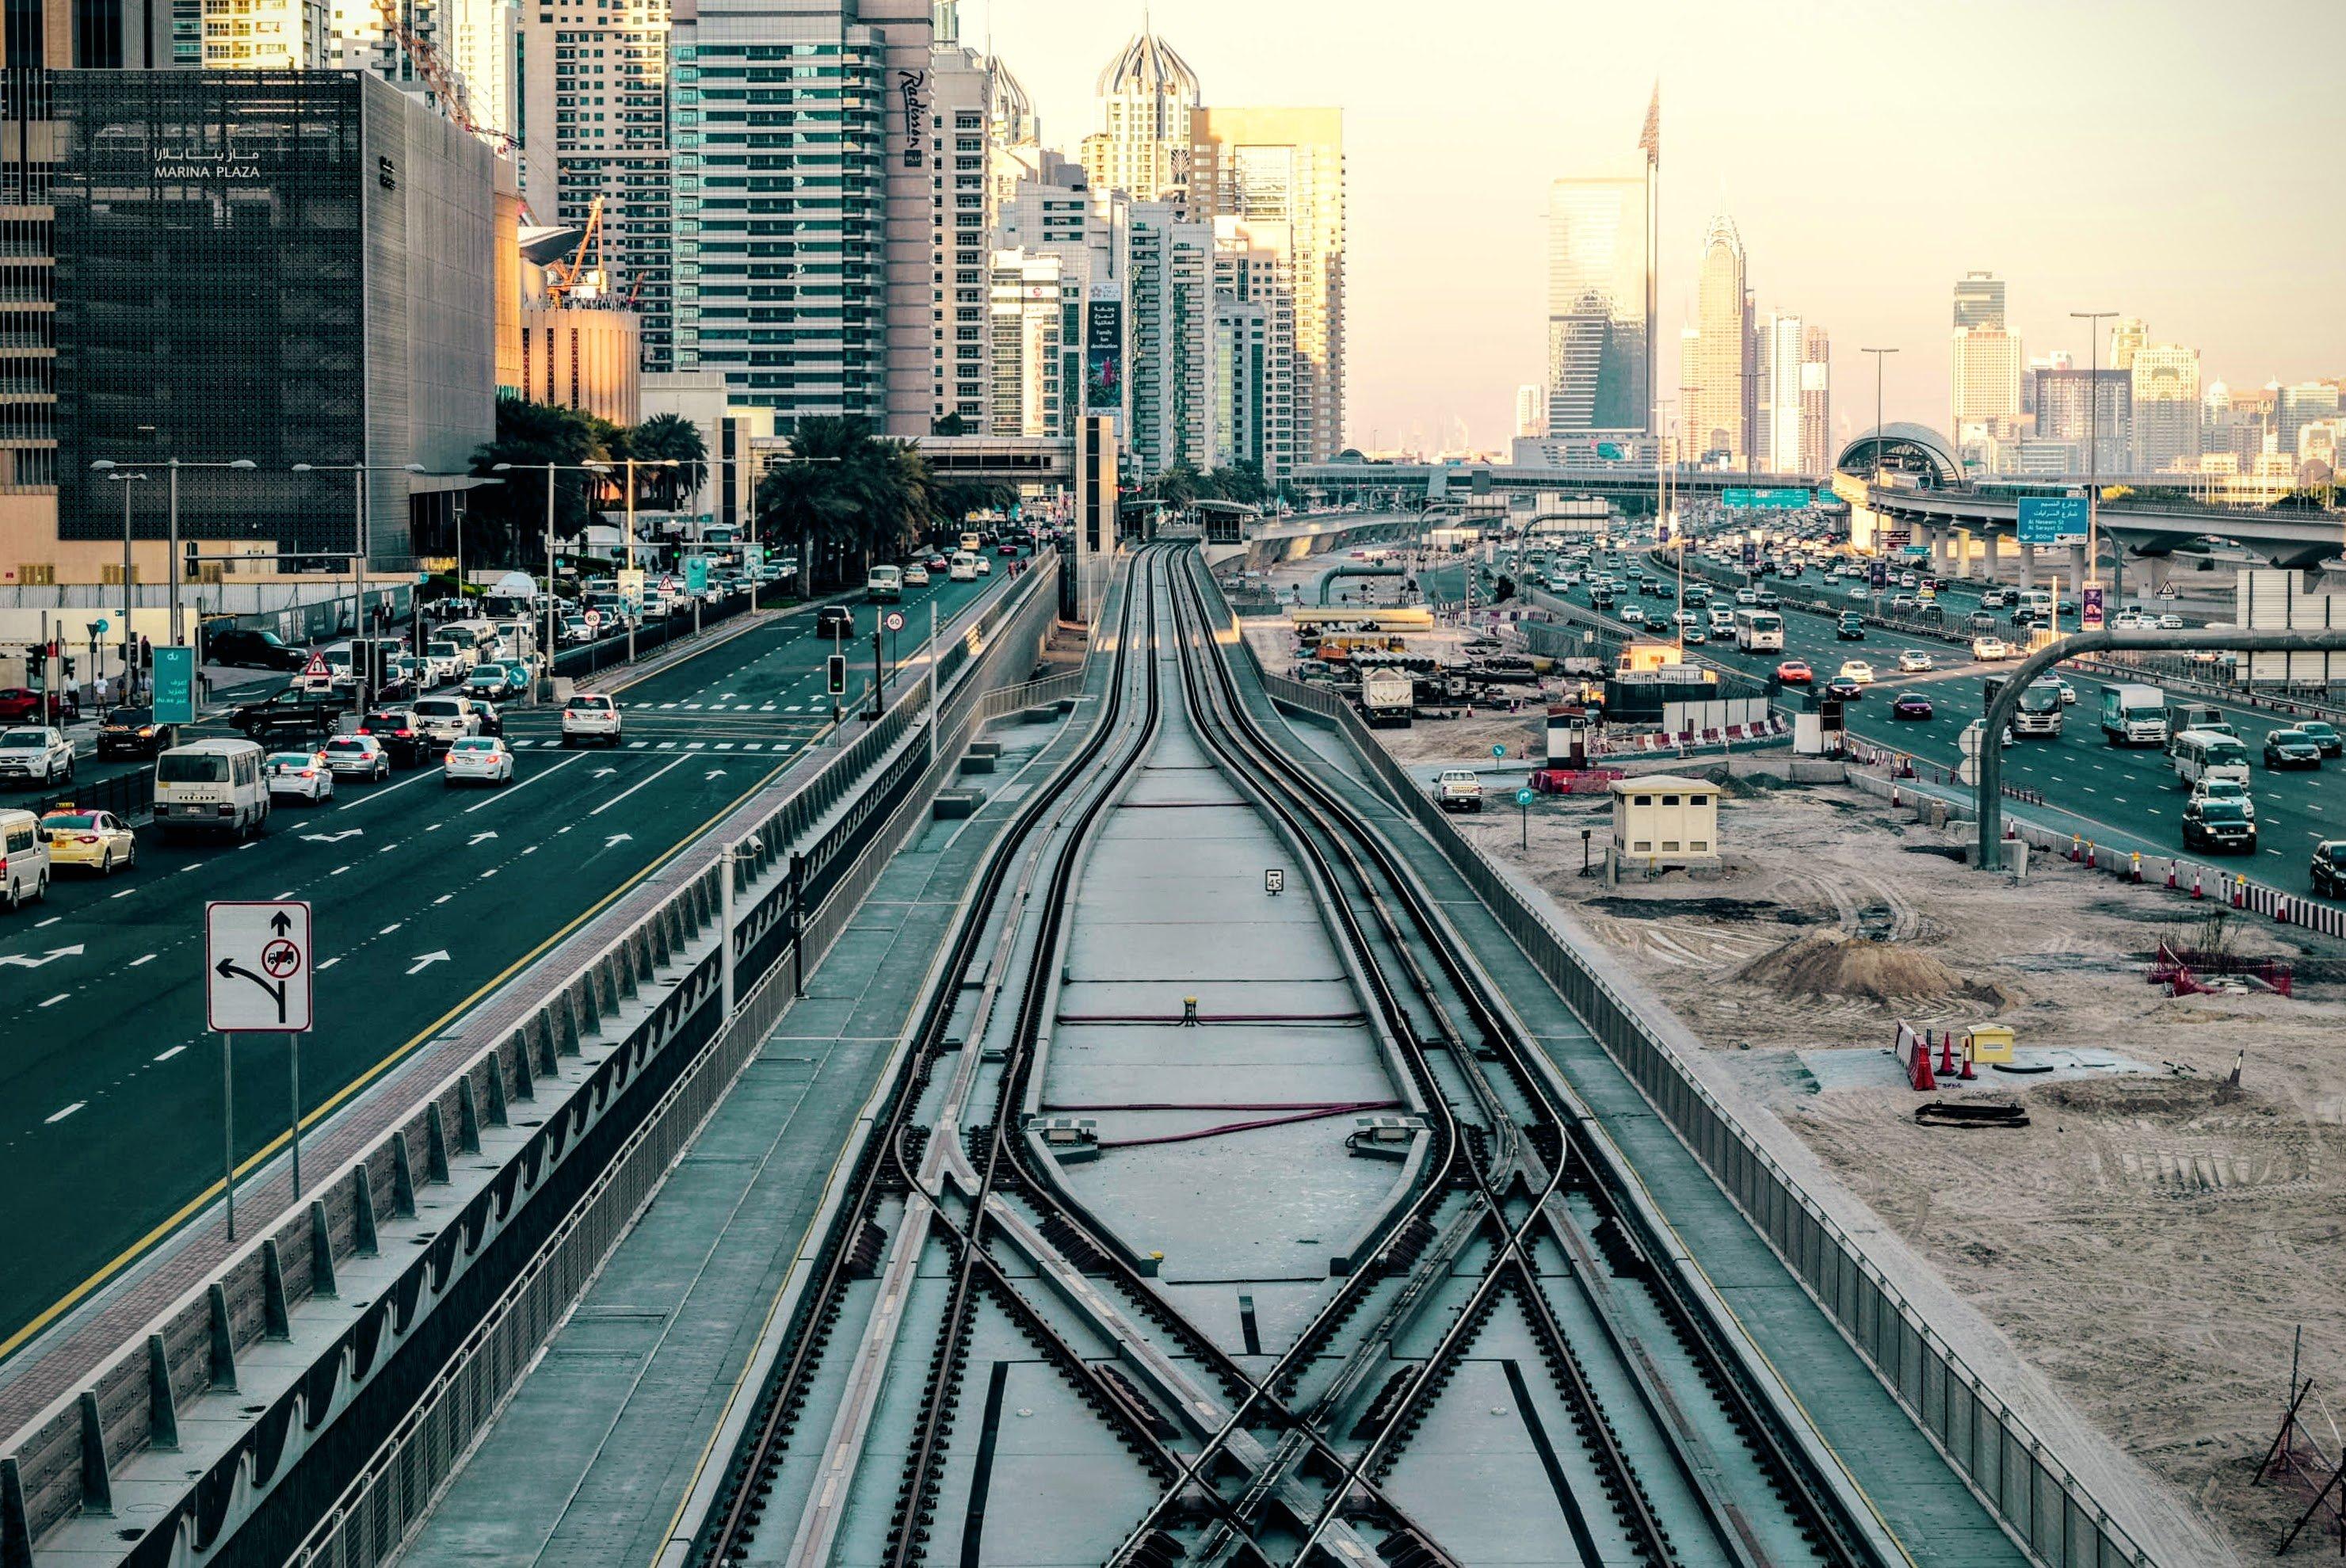 15 sad facts about Dubai